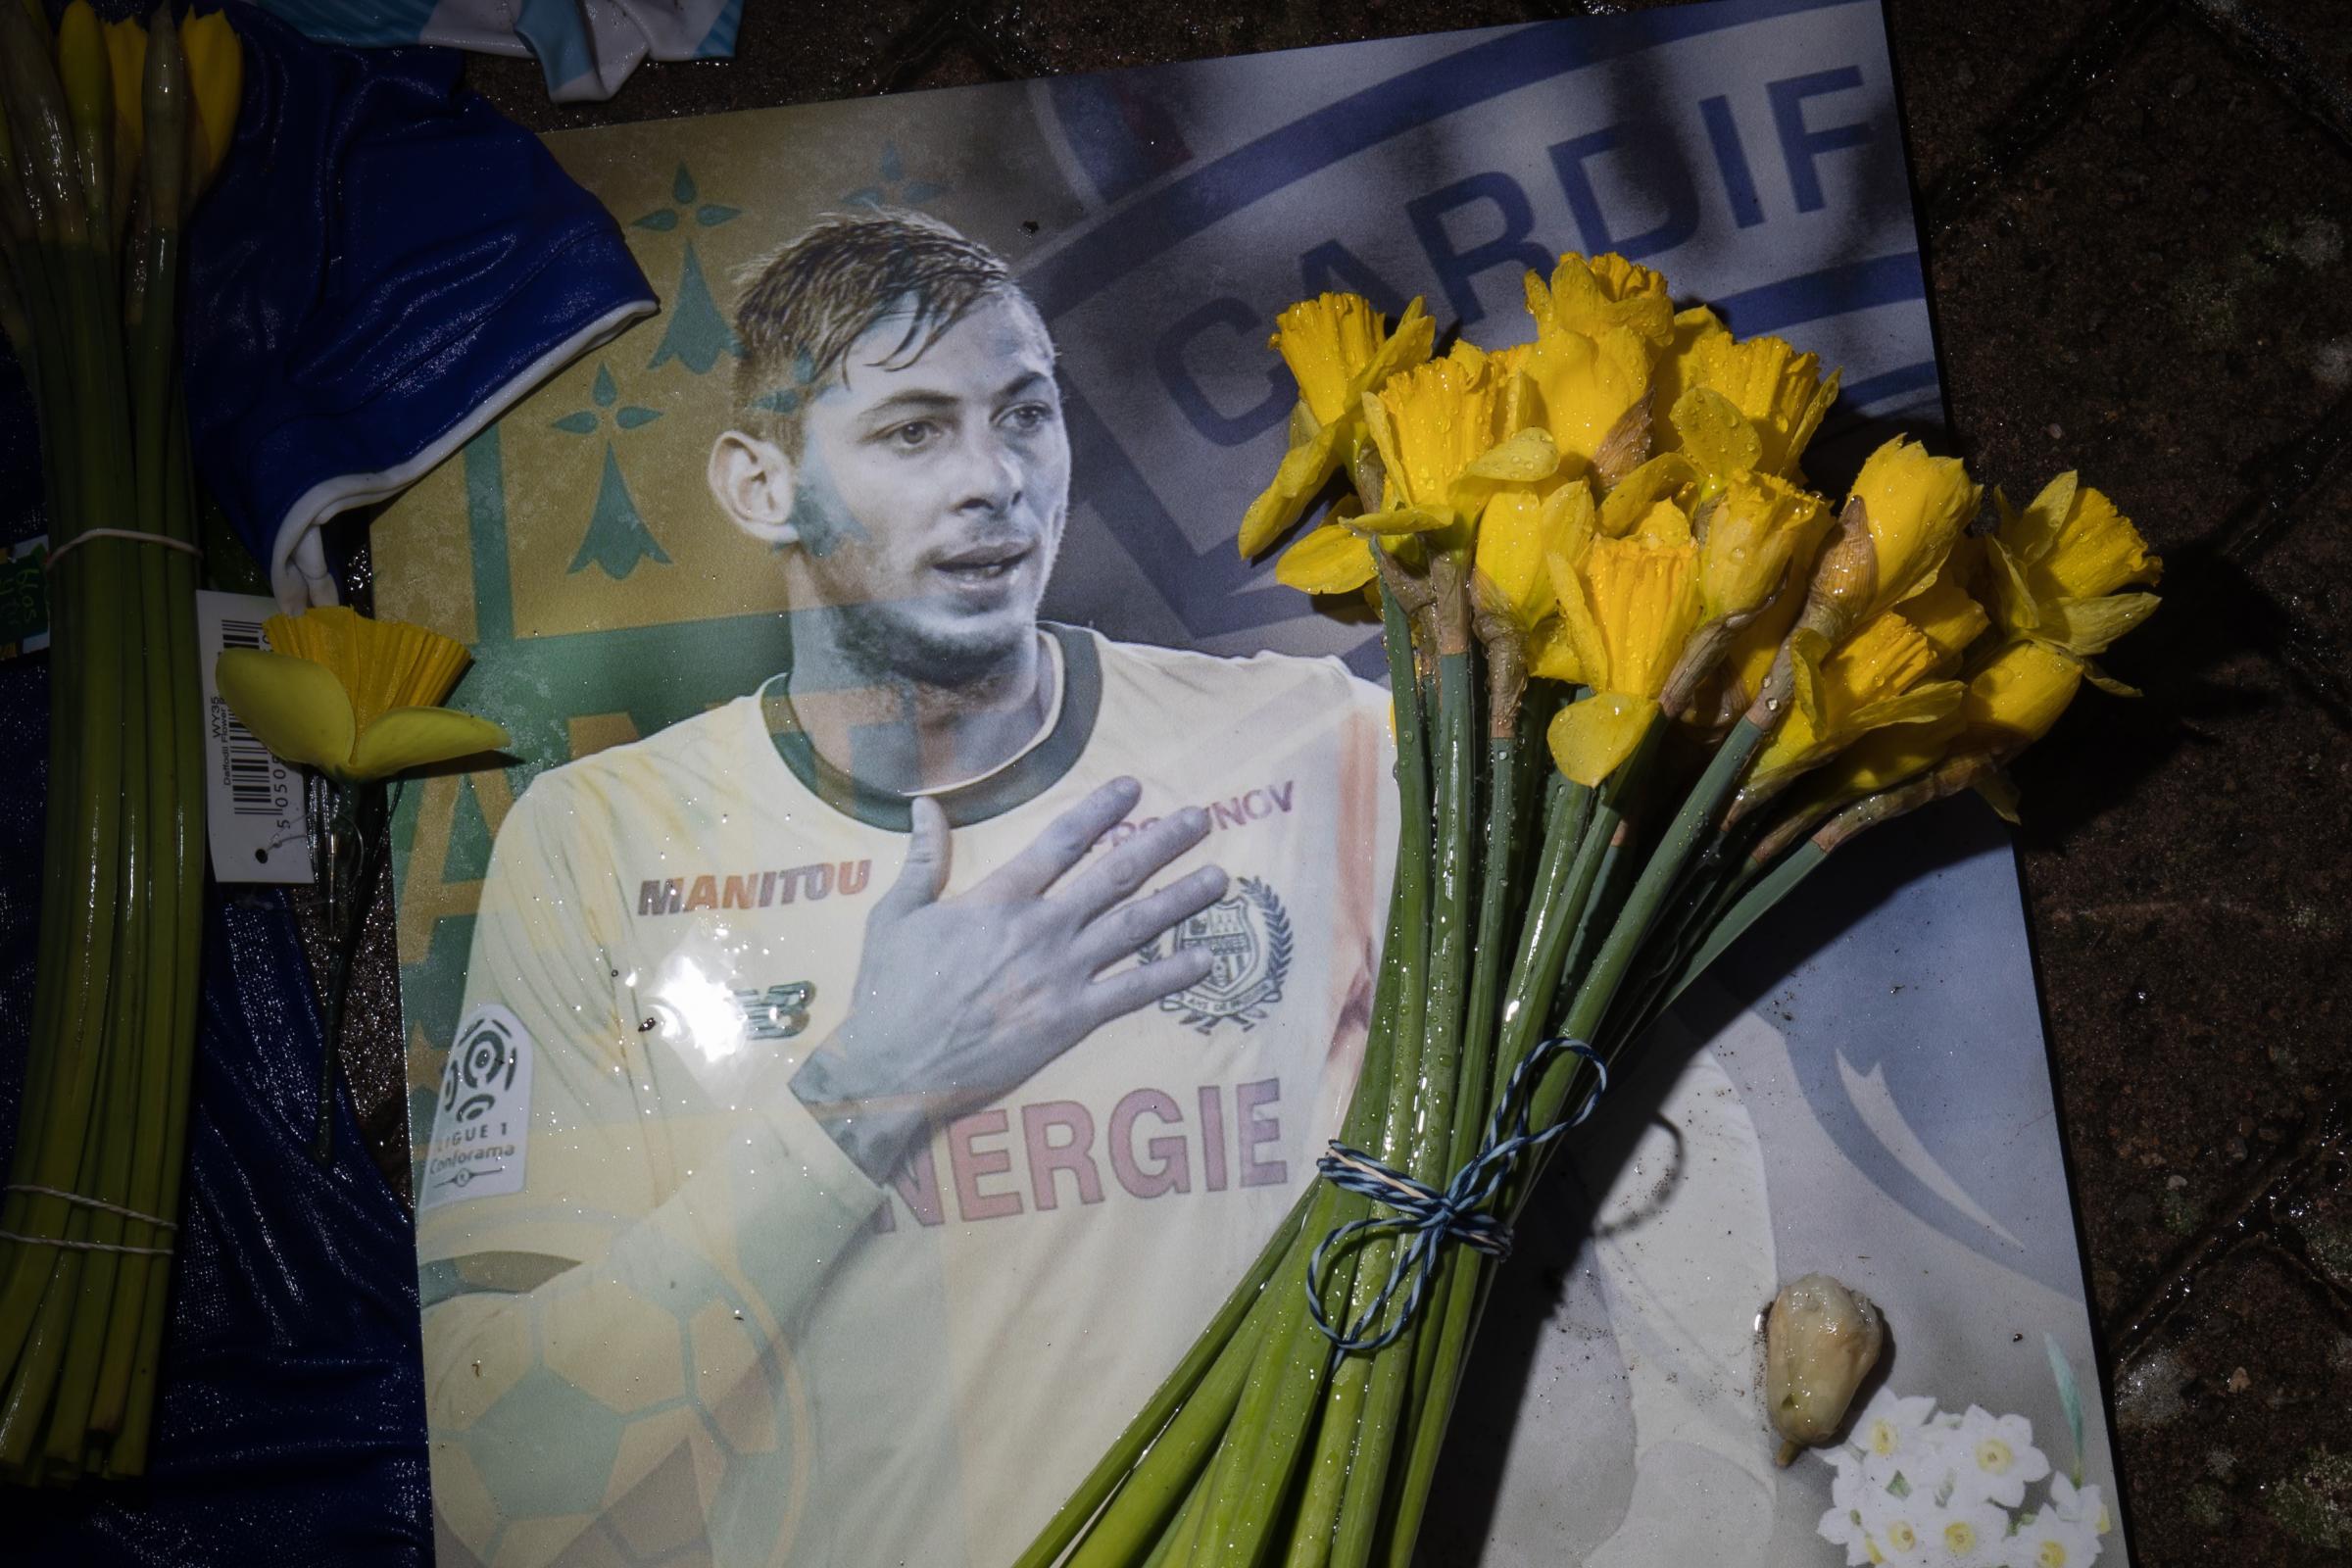 Clampdown urged on 'grey' charter flights after fatal Emiliano Sala plane crash